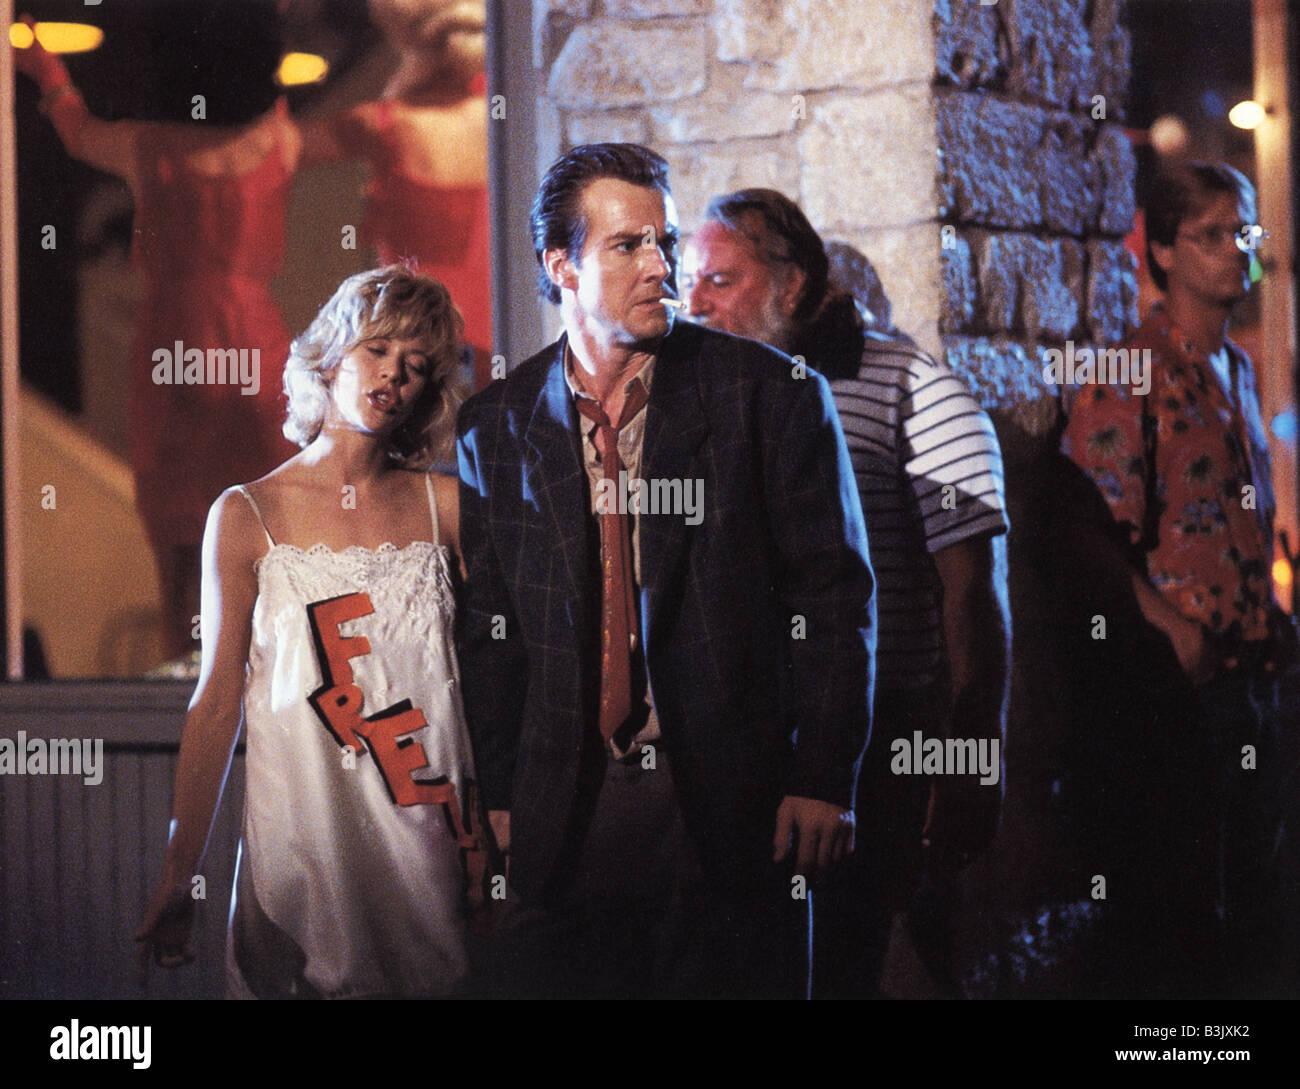 DOA 1988 Warner Film With Meg Ryan And Dennis Quaid At Left